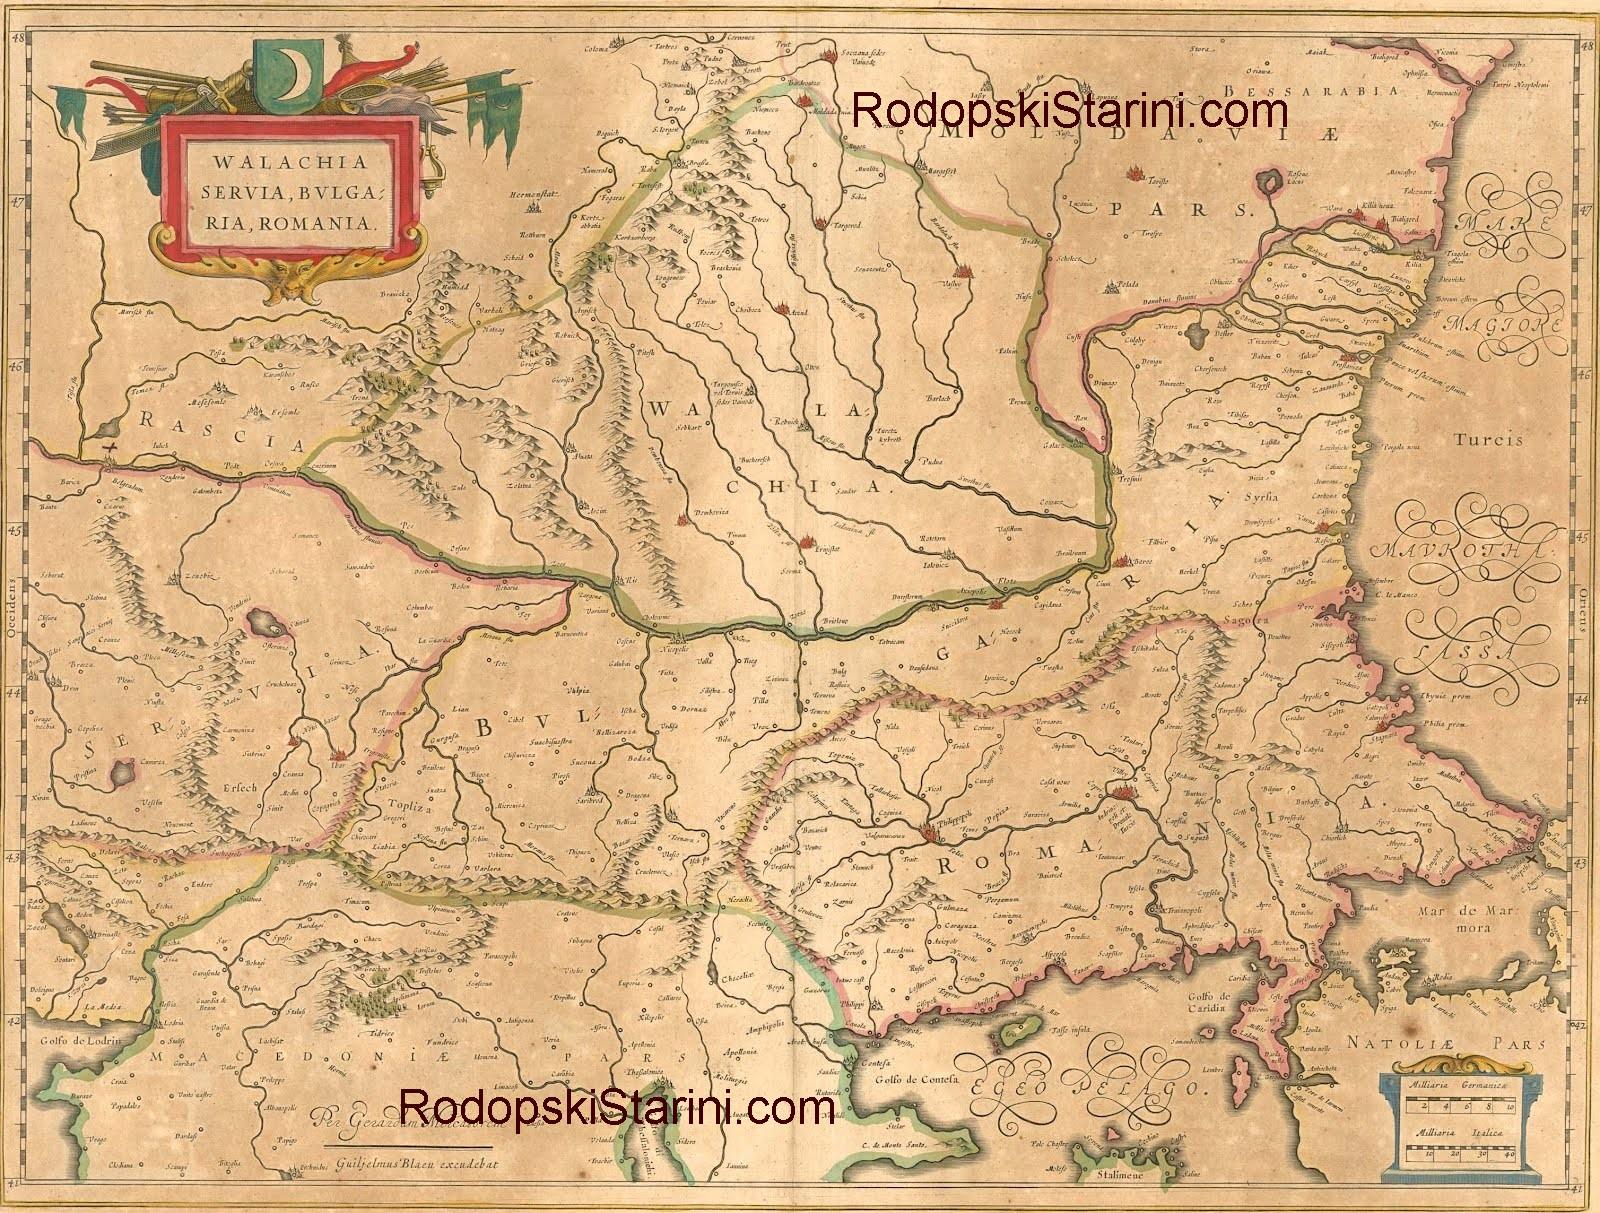 Rodopski Starini Stari Karti Na Balkanskiya Poluostrov 1154 1800 G